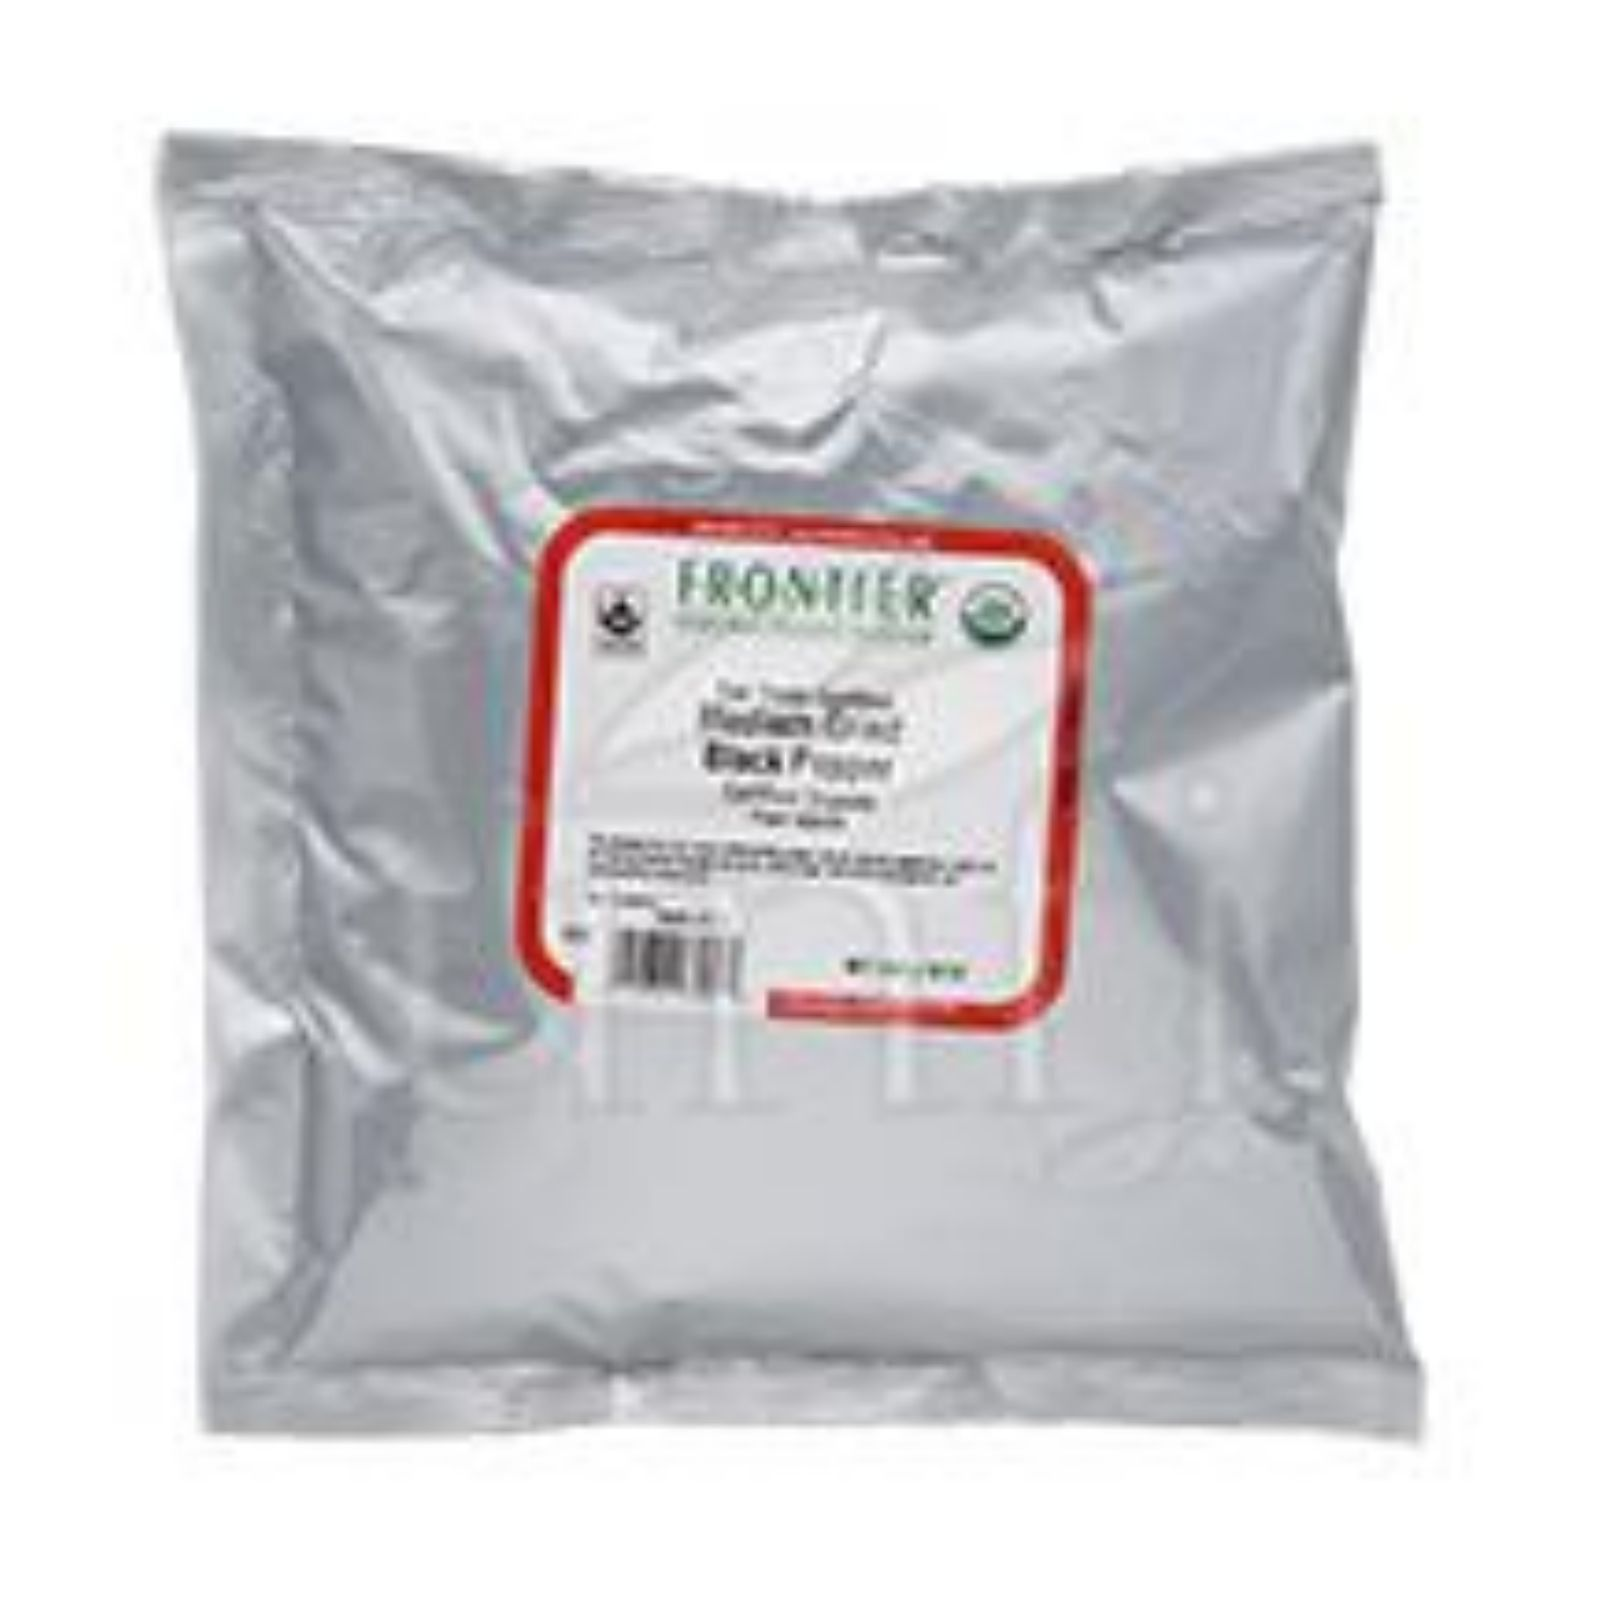 Frontier Herb Pepper - Organic - Fair Trade Certified - Black - Medium Grind - Bulk - 1 lb